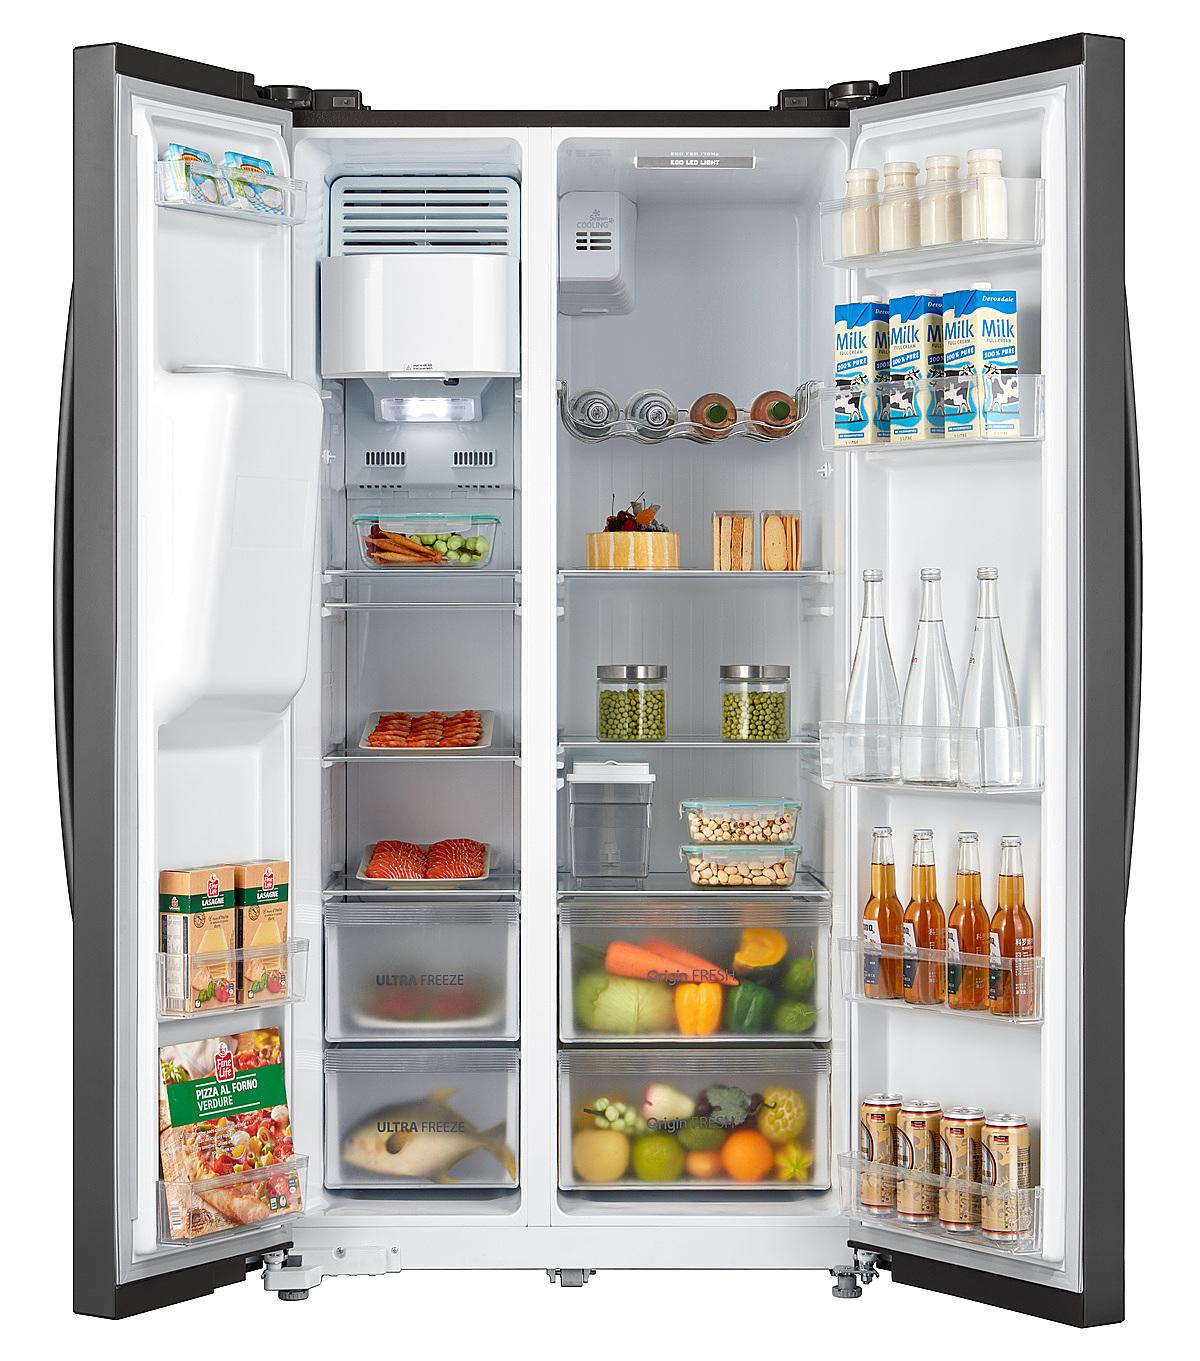 Tủ lạnh side-by-side RS637WE của Toshiba. Ảnh: Toshiba.